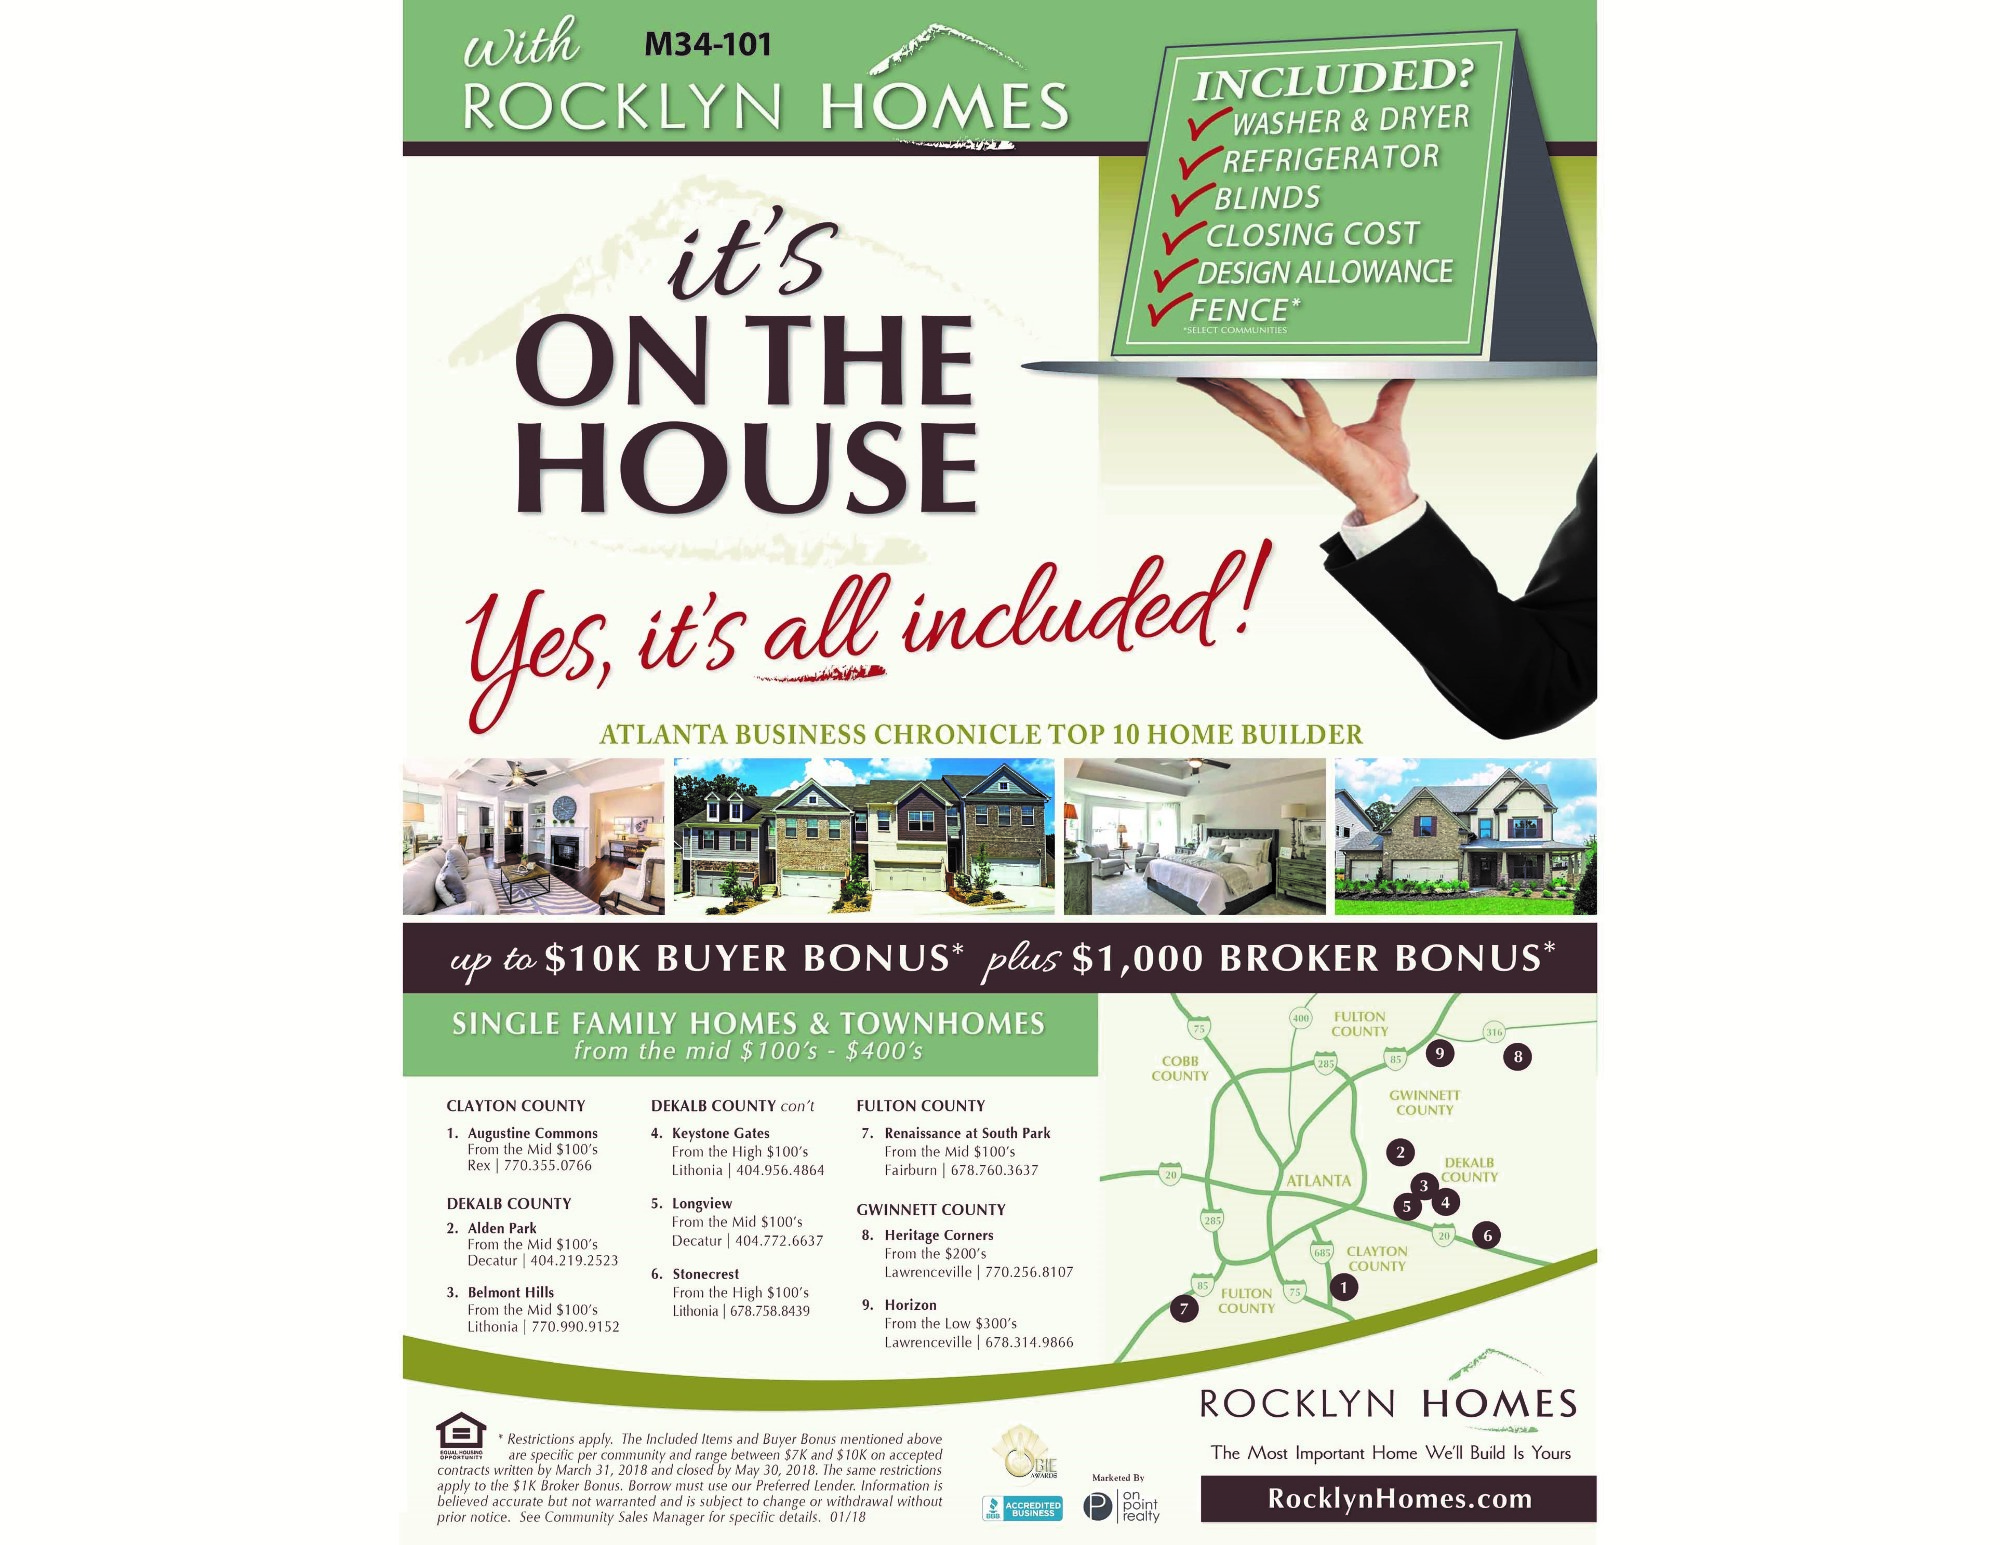 Rocklyn Homes Wins Gold OBIE for Best Flyer/Mailer